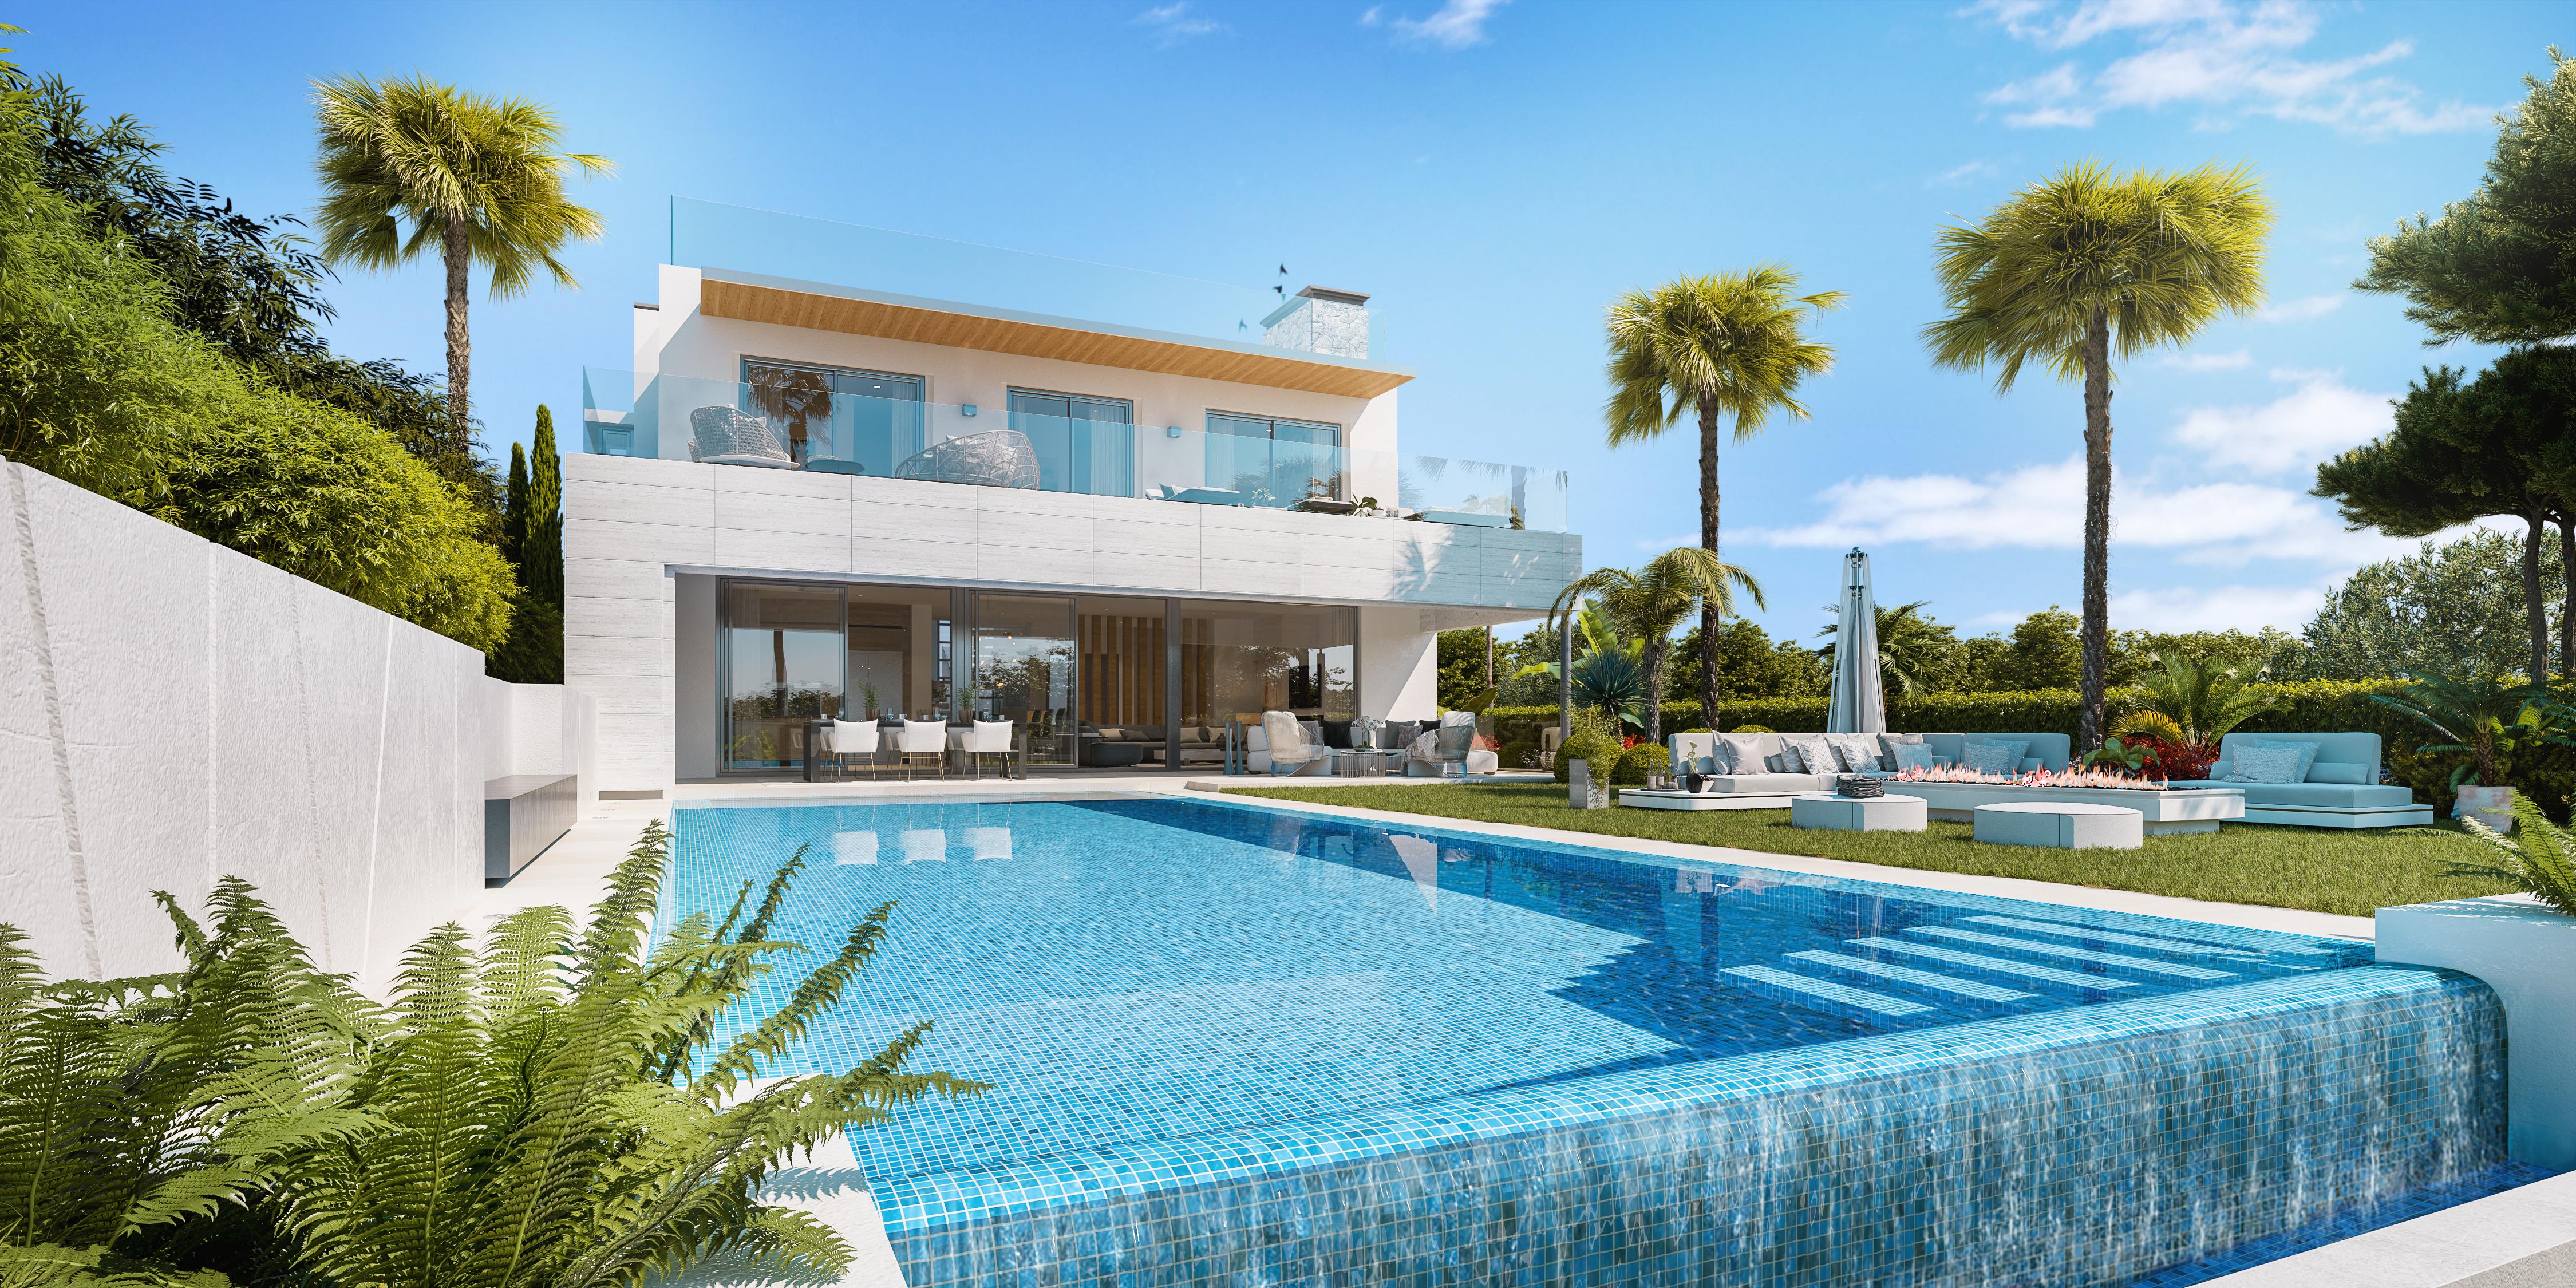 359-00038P: Villa in Marbella